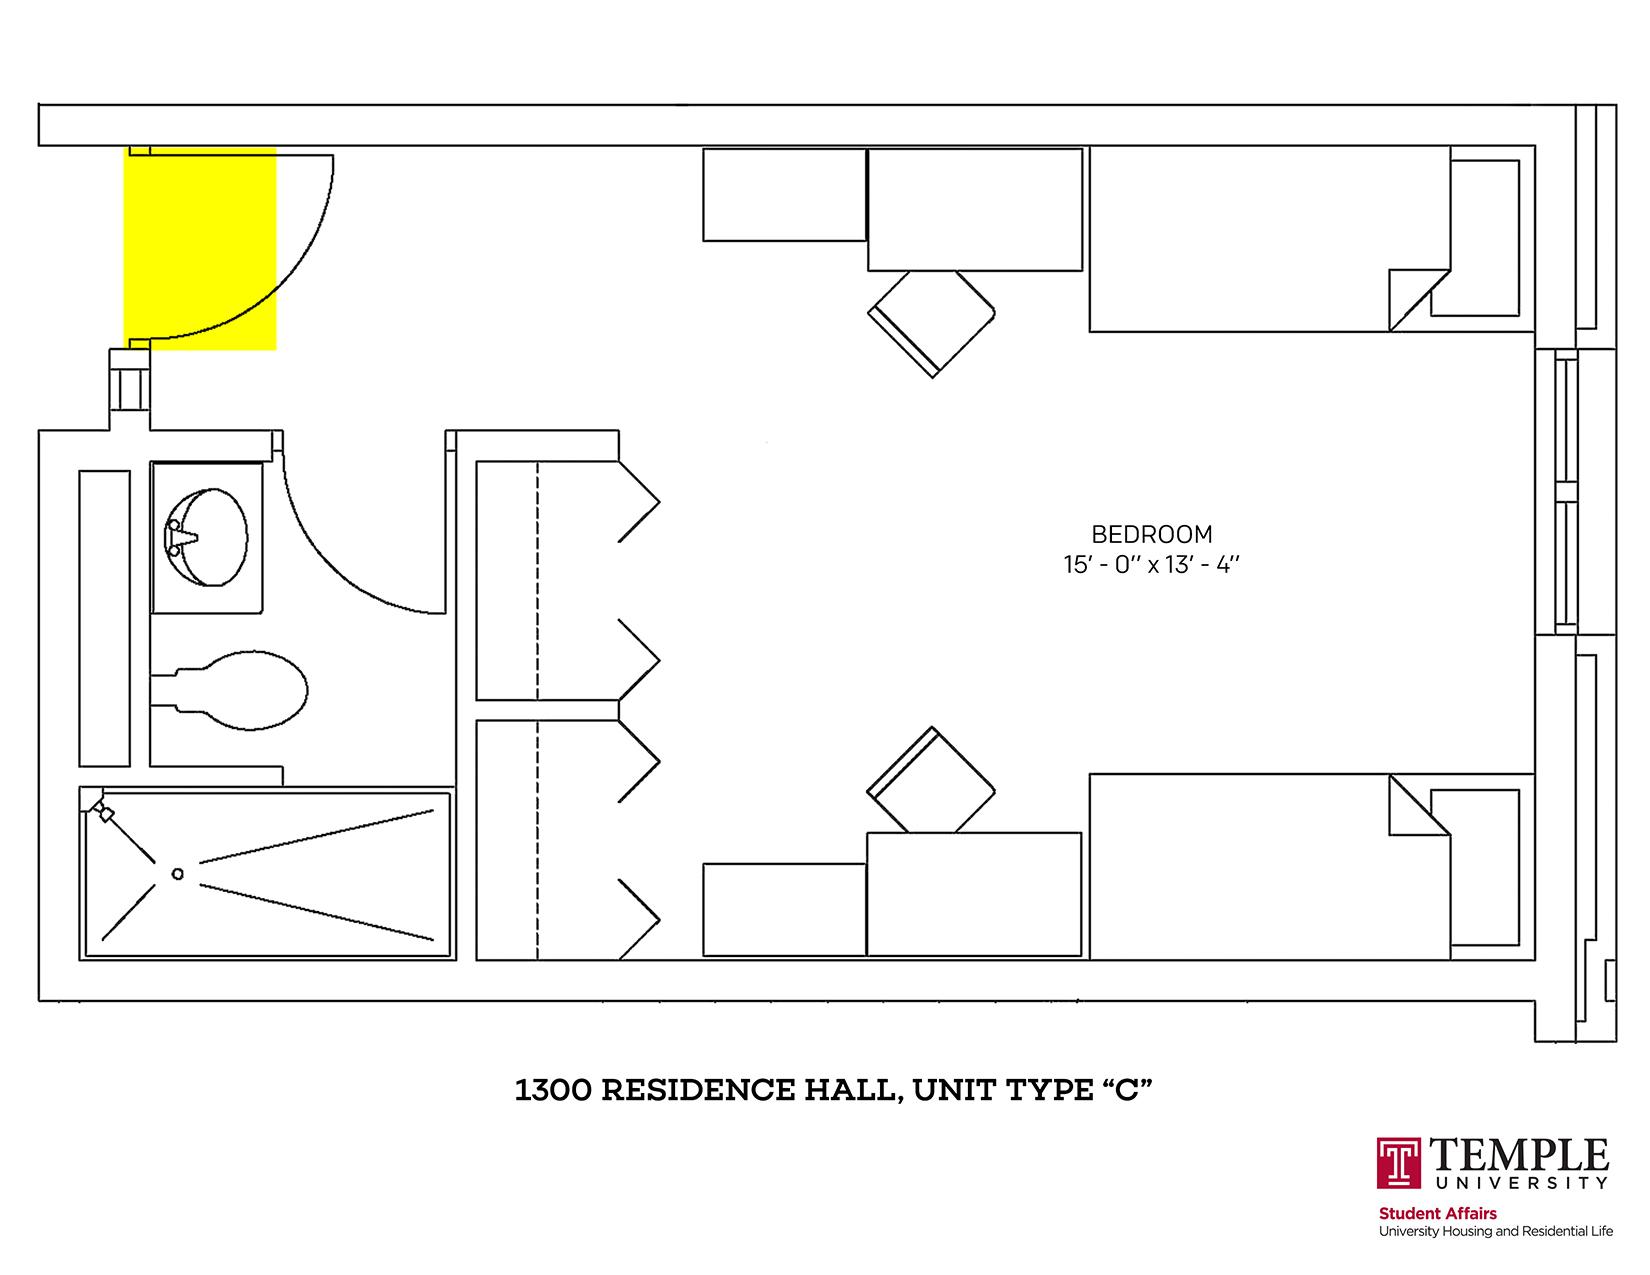 1300 Residence Hall: Unit C